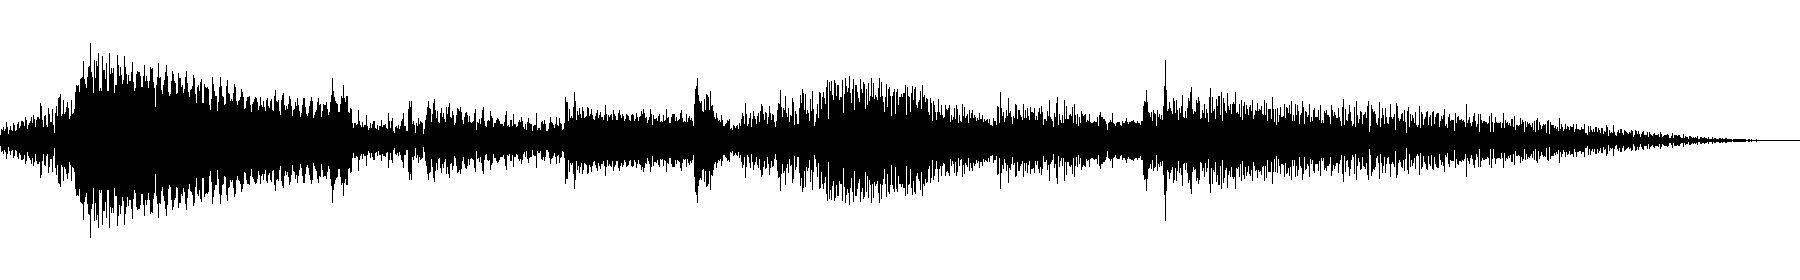 112 a gtrsequence3 4 sp 0